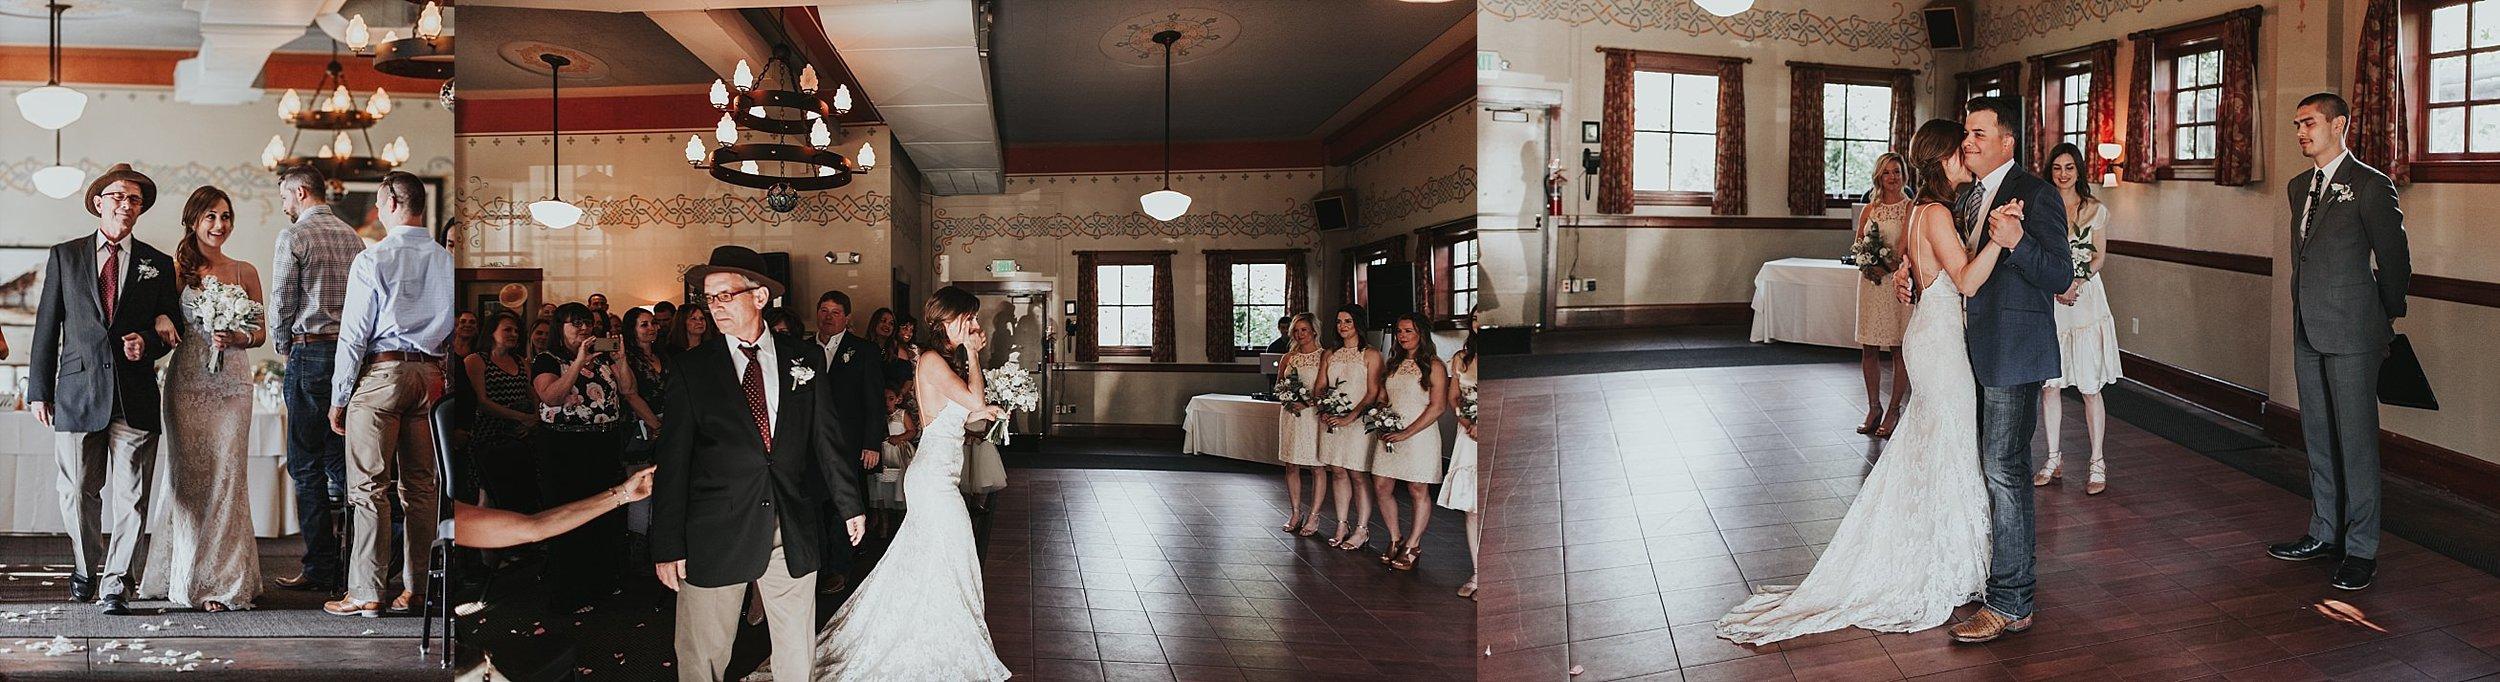 Oregon Wedding Photographer McMenamins (21).jpg